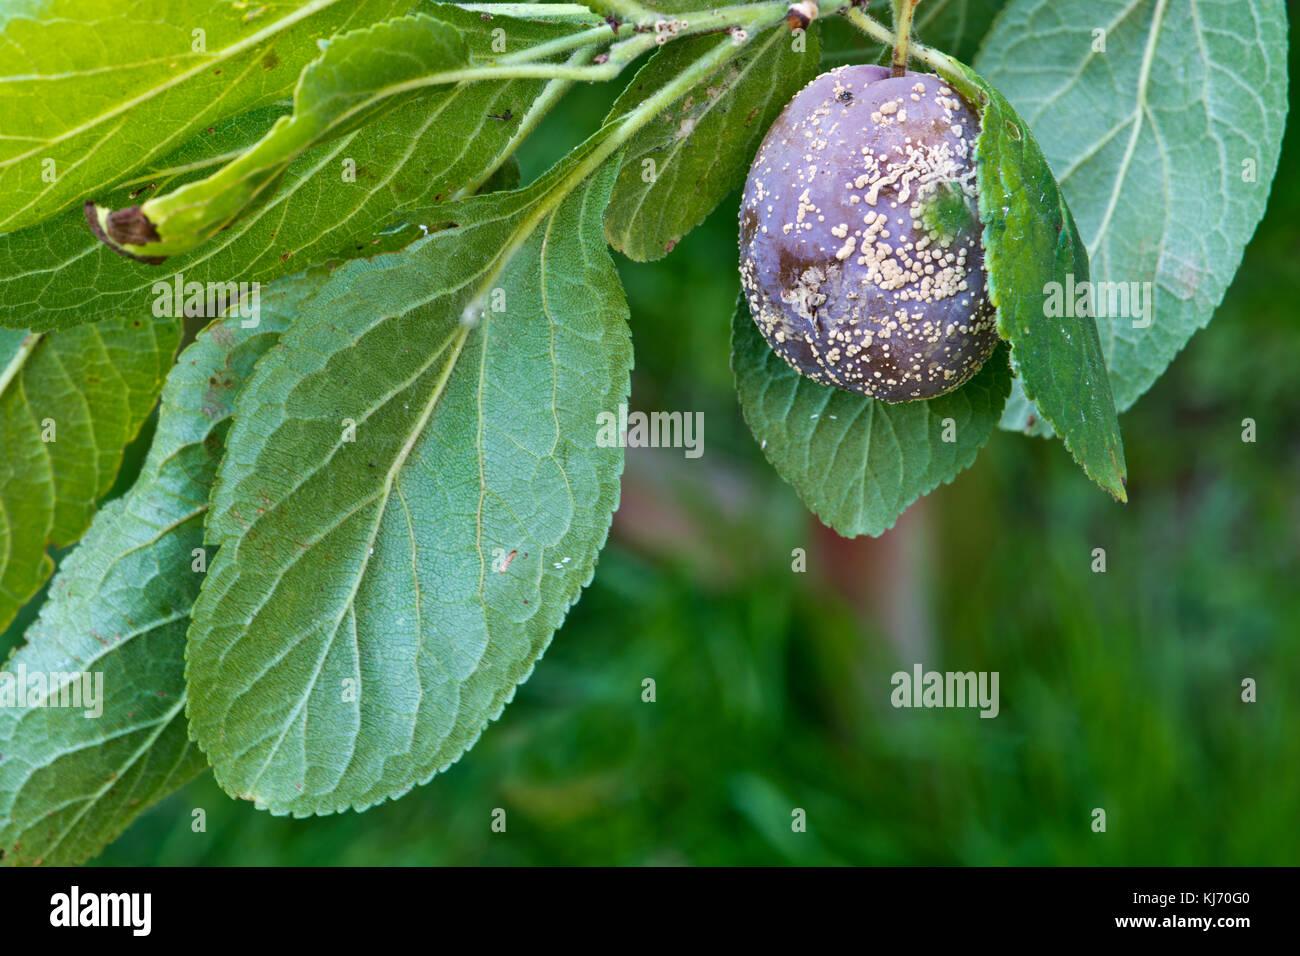 brown rot fungal disease (Monilinia fructicola) on a single plum. - Stock Image